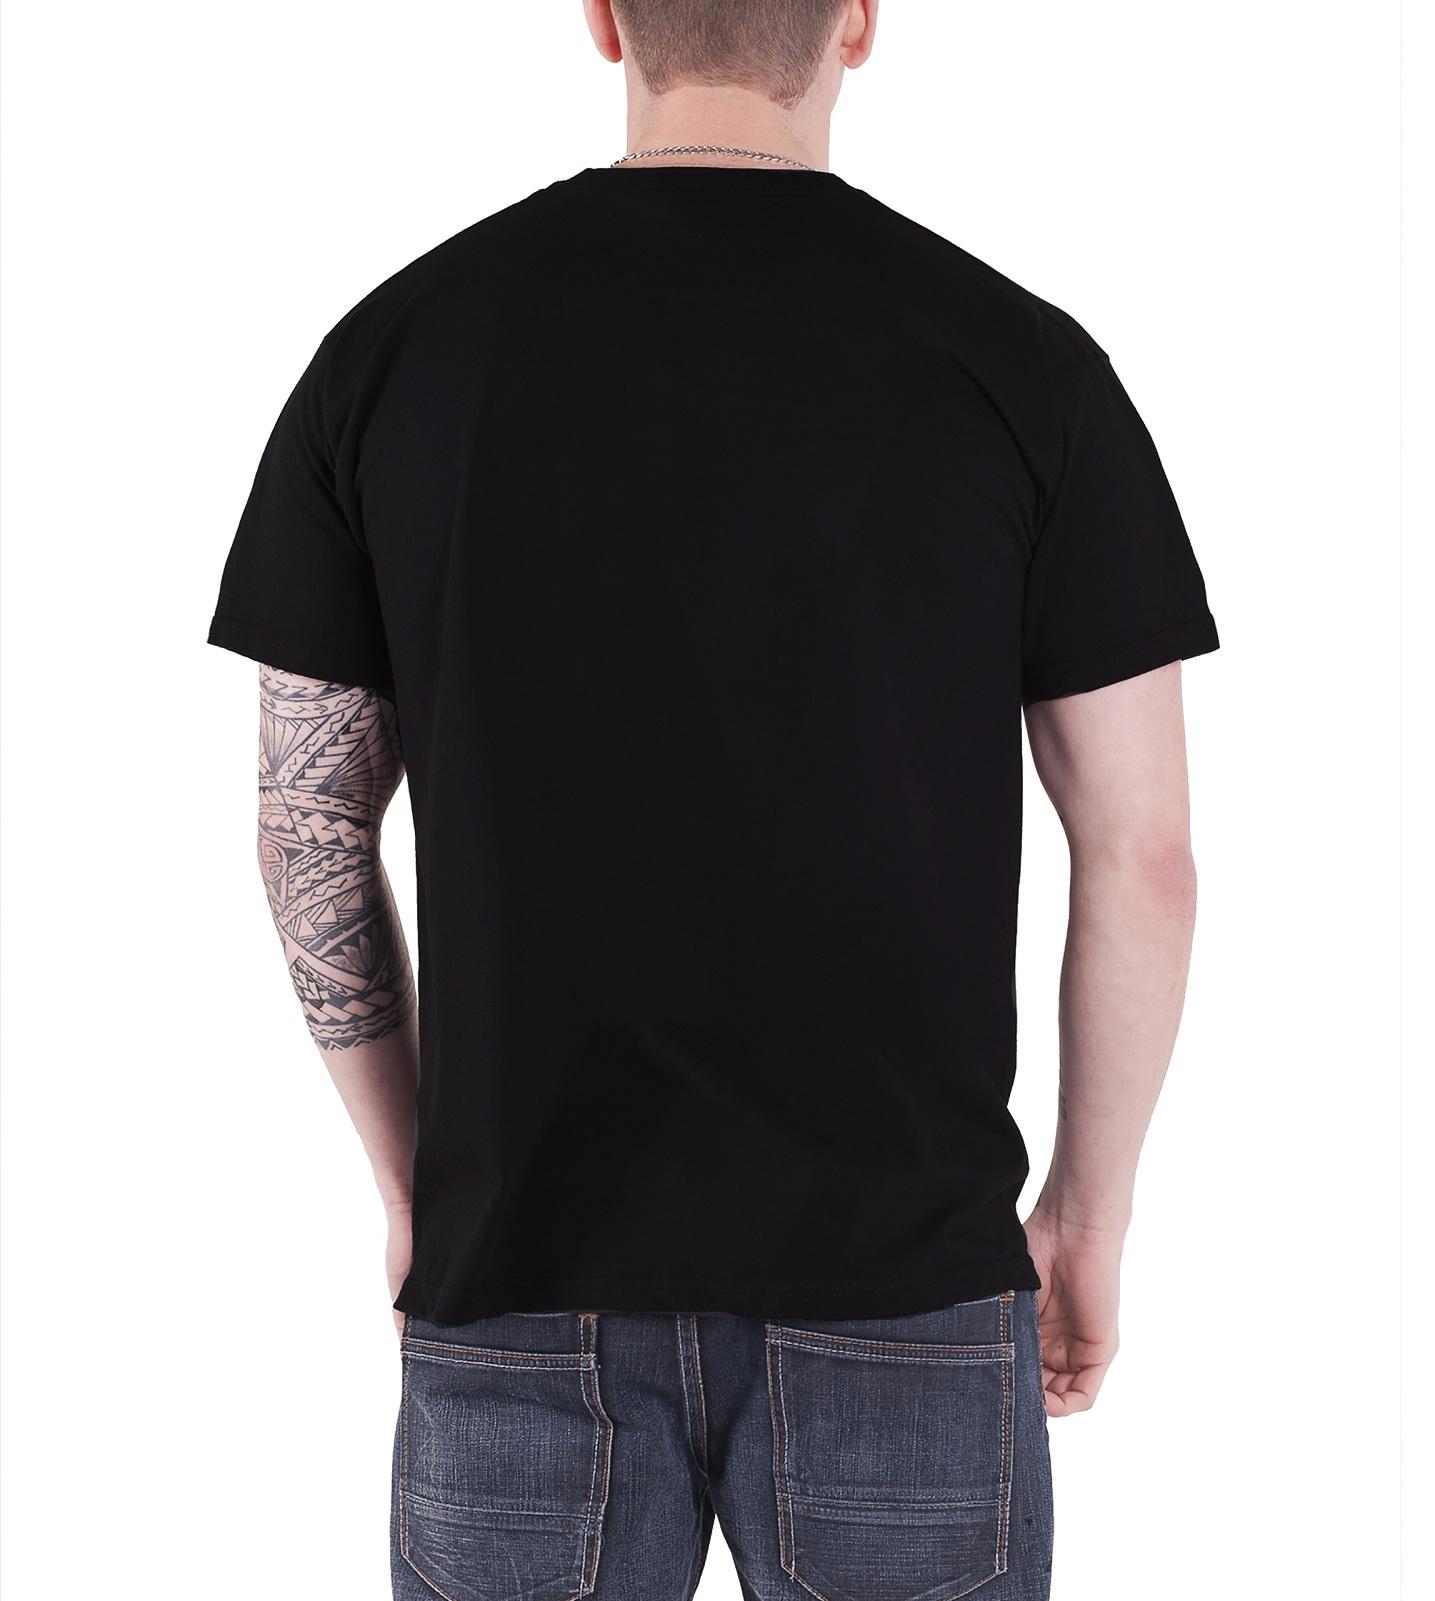 Officiel-Hawkwind-T-Shirt-Warrior-on-the-Edge-Space-Ritual-Doremi-homme-nouveau miniature 13